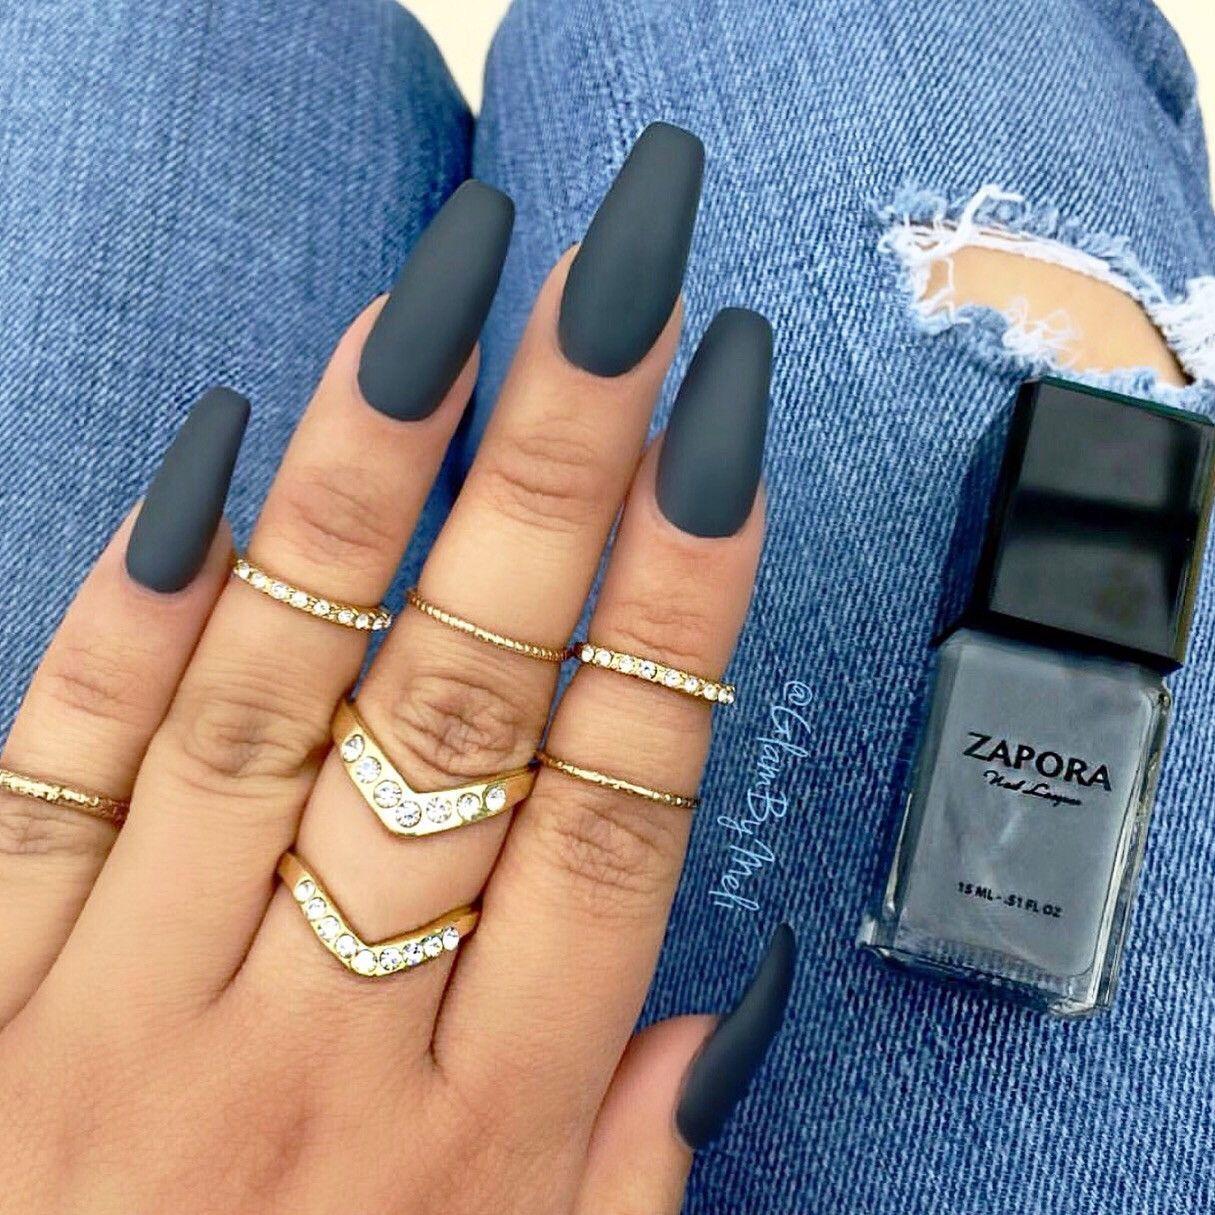 GUNMETAL – ZAPORA Nail Lacquer | Nails | Pinterest | Coffin nails ...